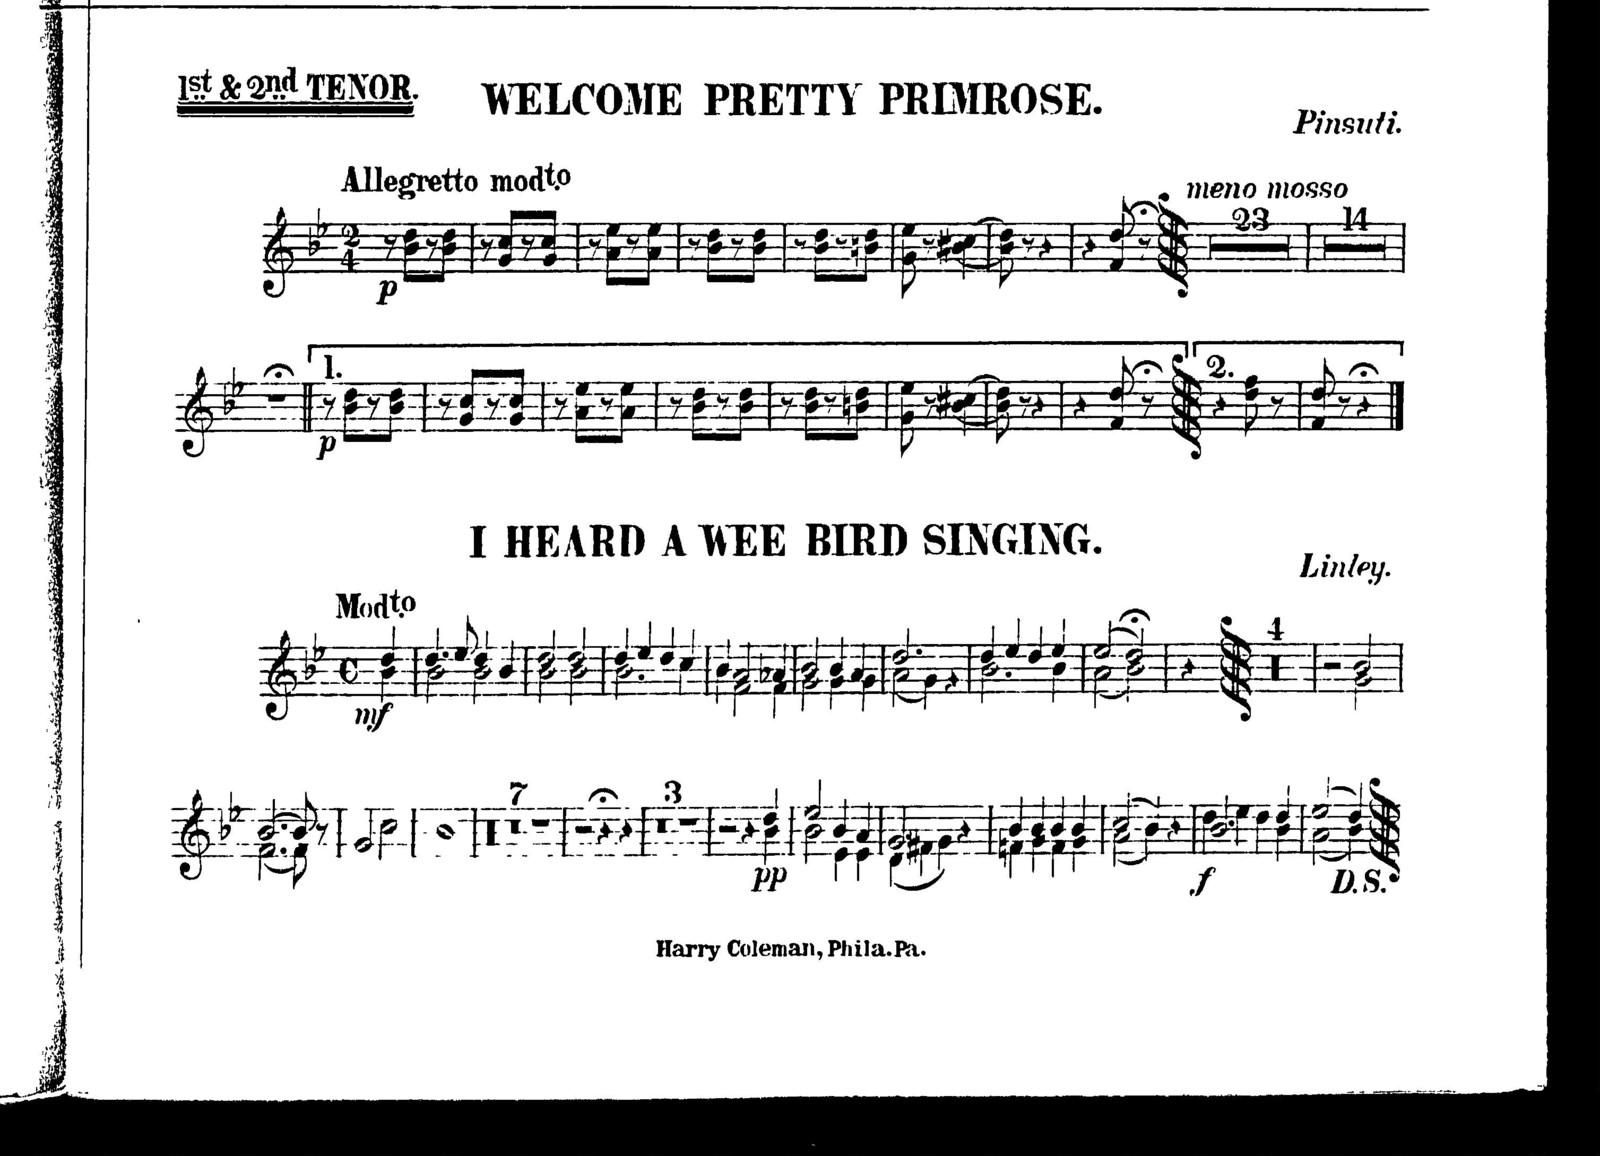 Welcome pretty primrose [and] I heard a wee bird singing